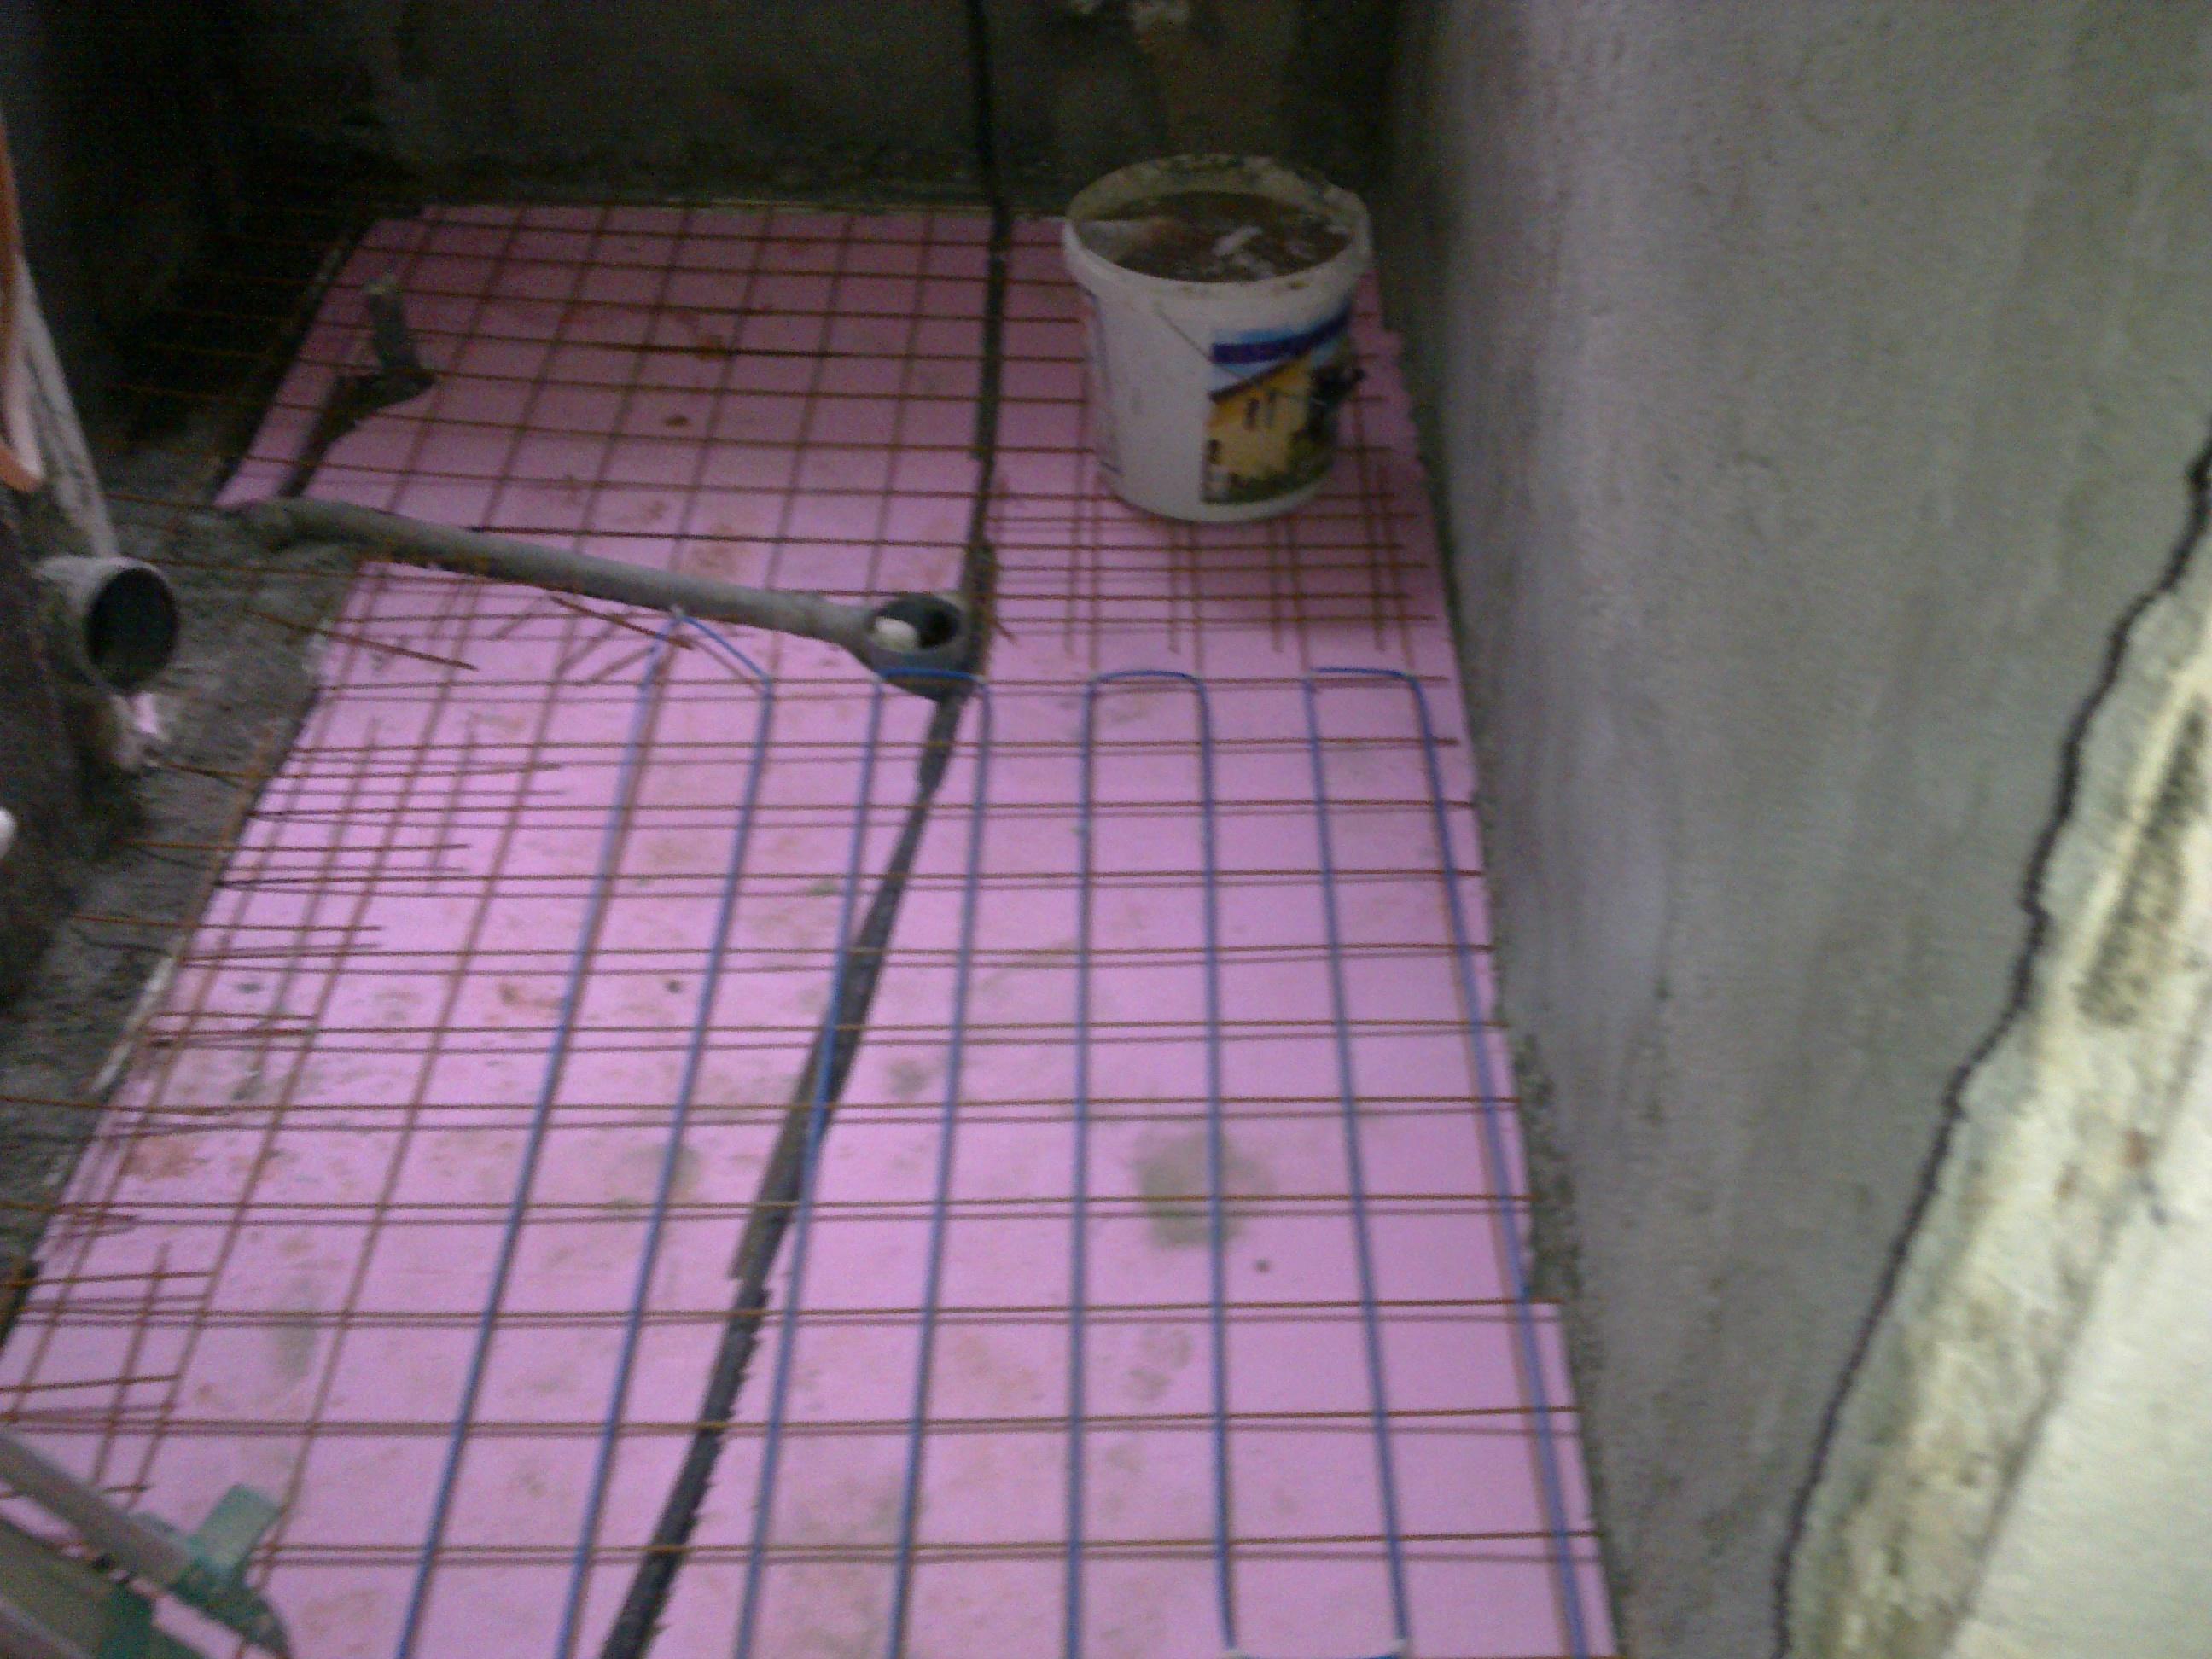 Incalzire in pardoseala - renovare apartament Calimanesti, jud Valcea RAYCHEM - Poza 16